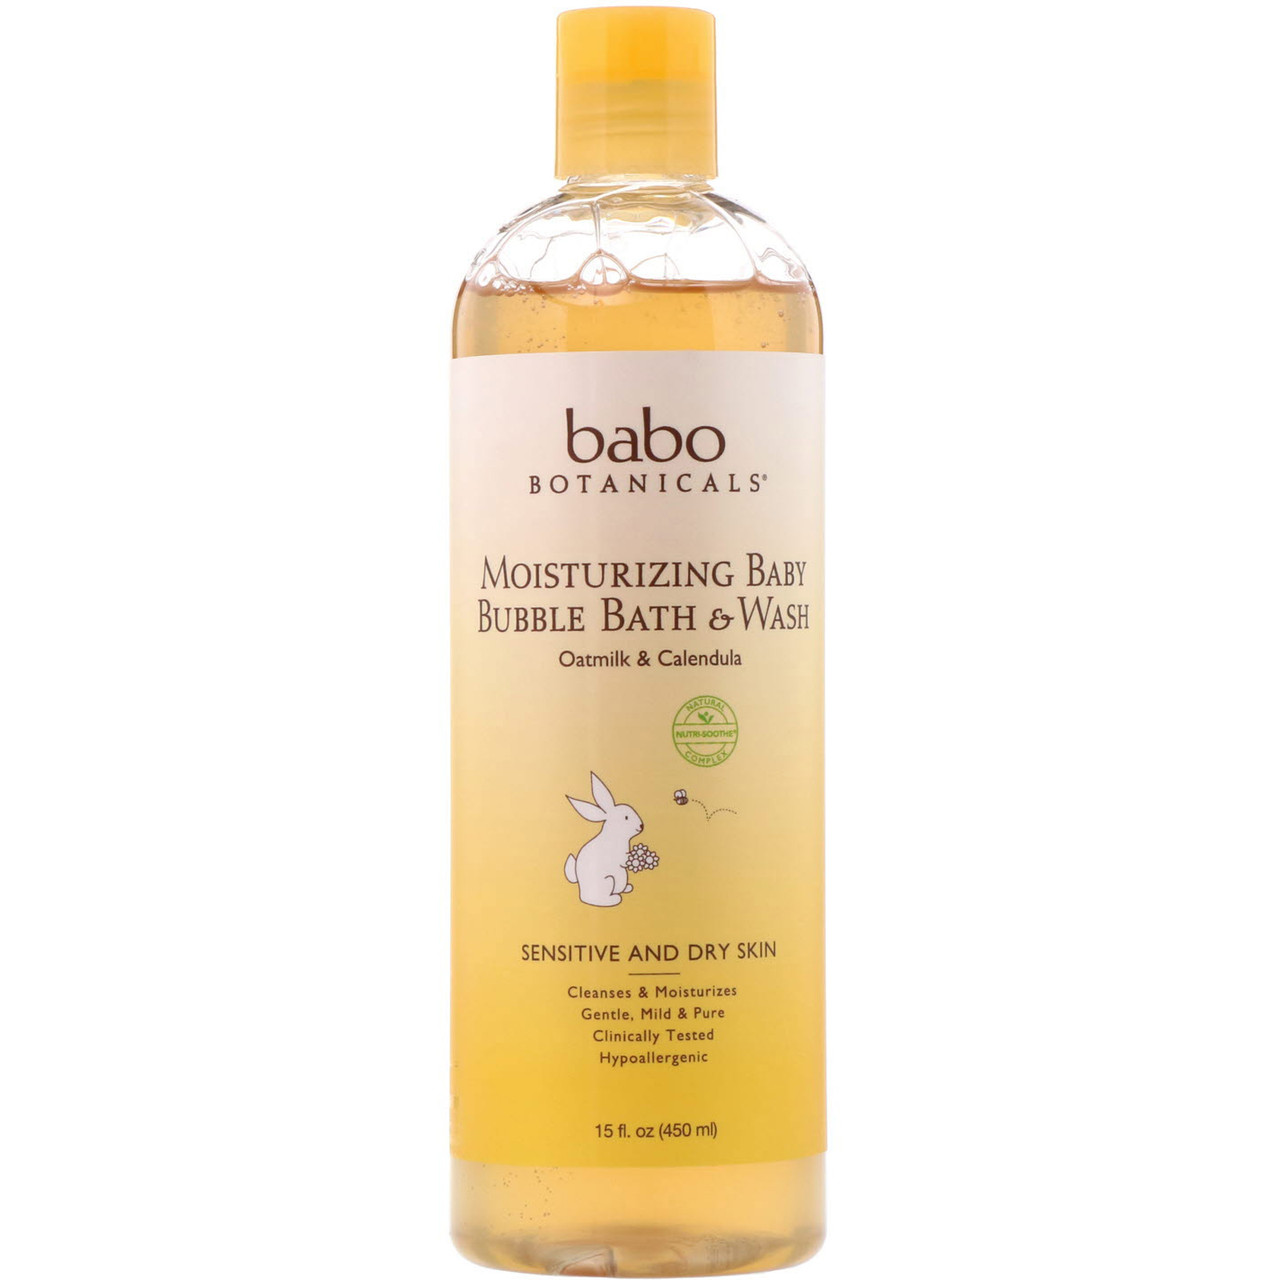 Babo Botanicals, Moisturizing Baby Bubble Bath & Wash, Oatmilk Calendula, 15 fl oz (450 ml)